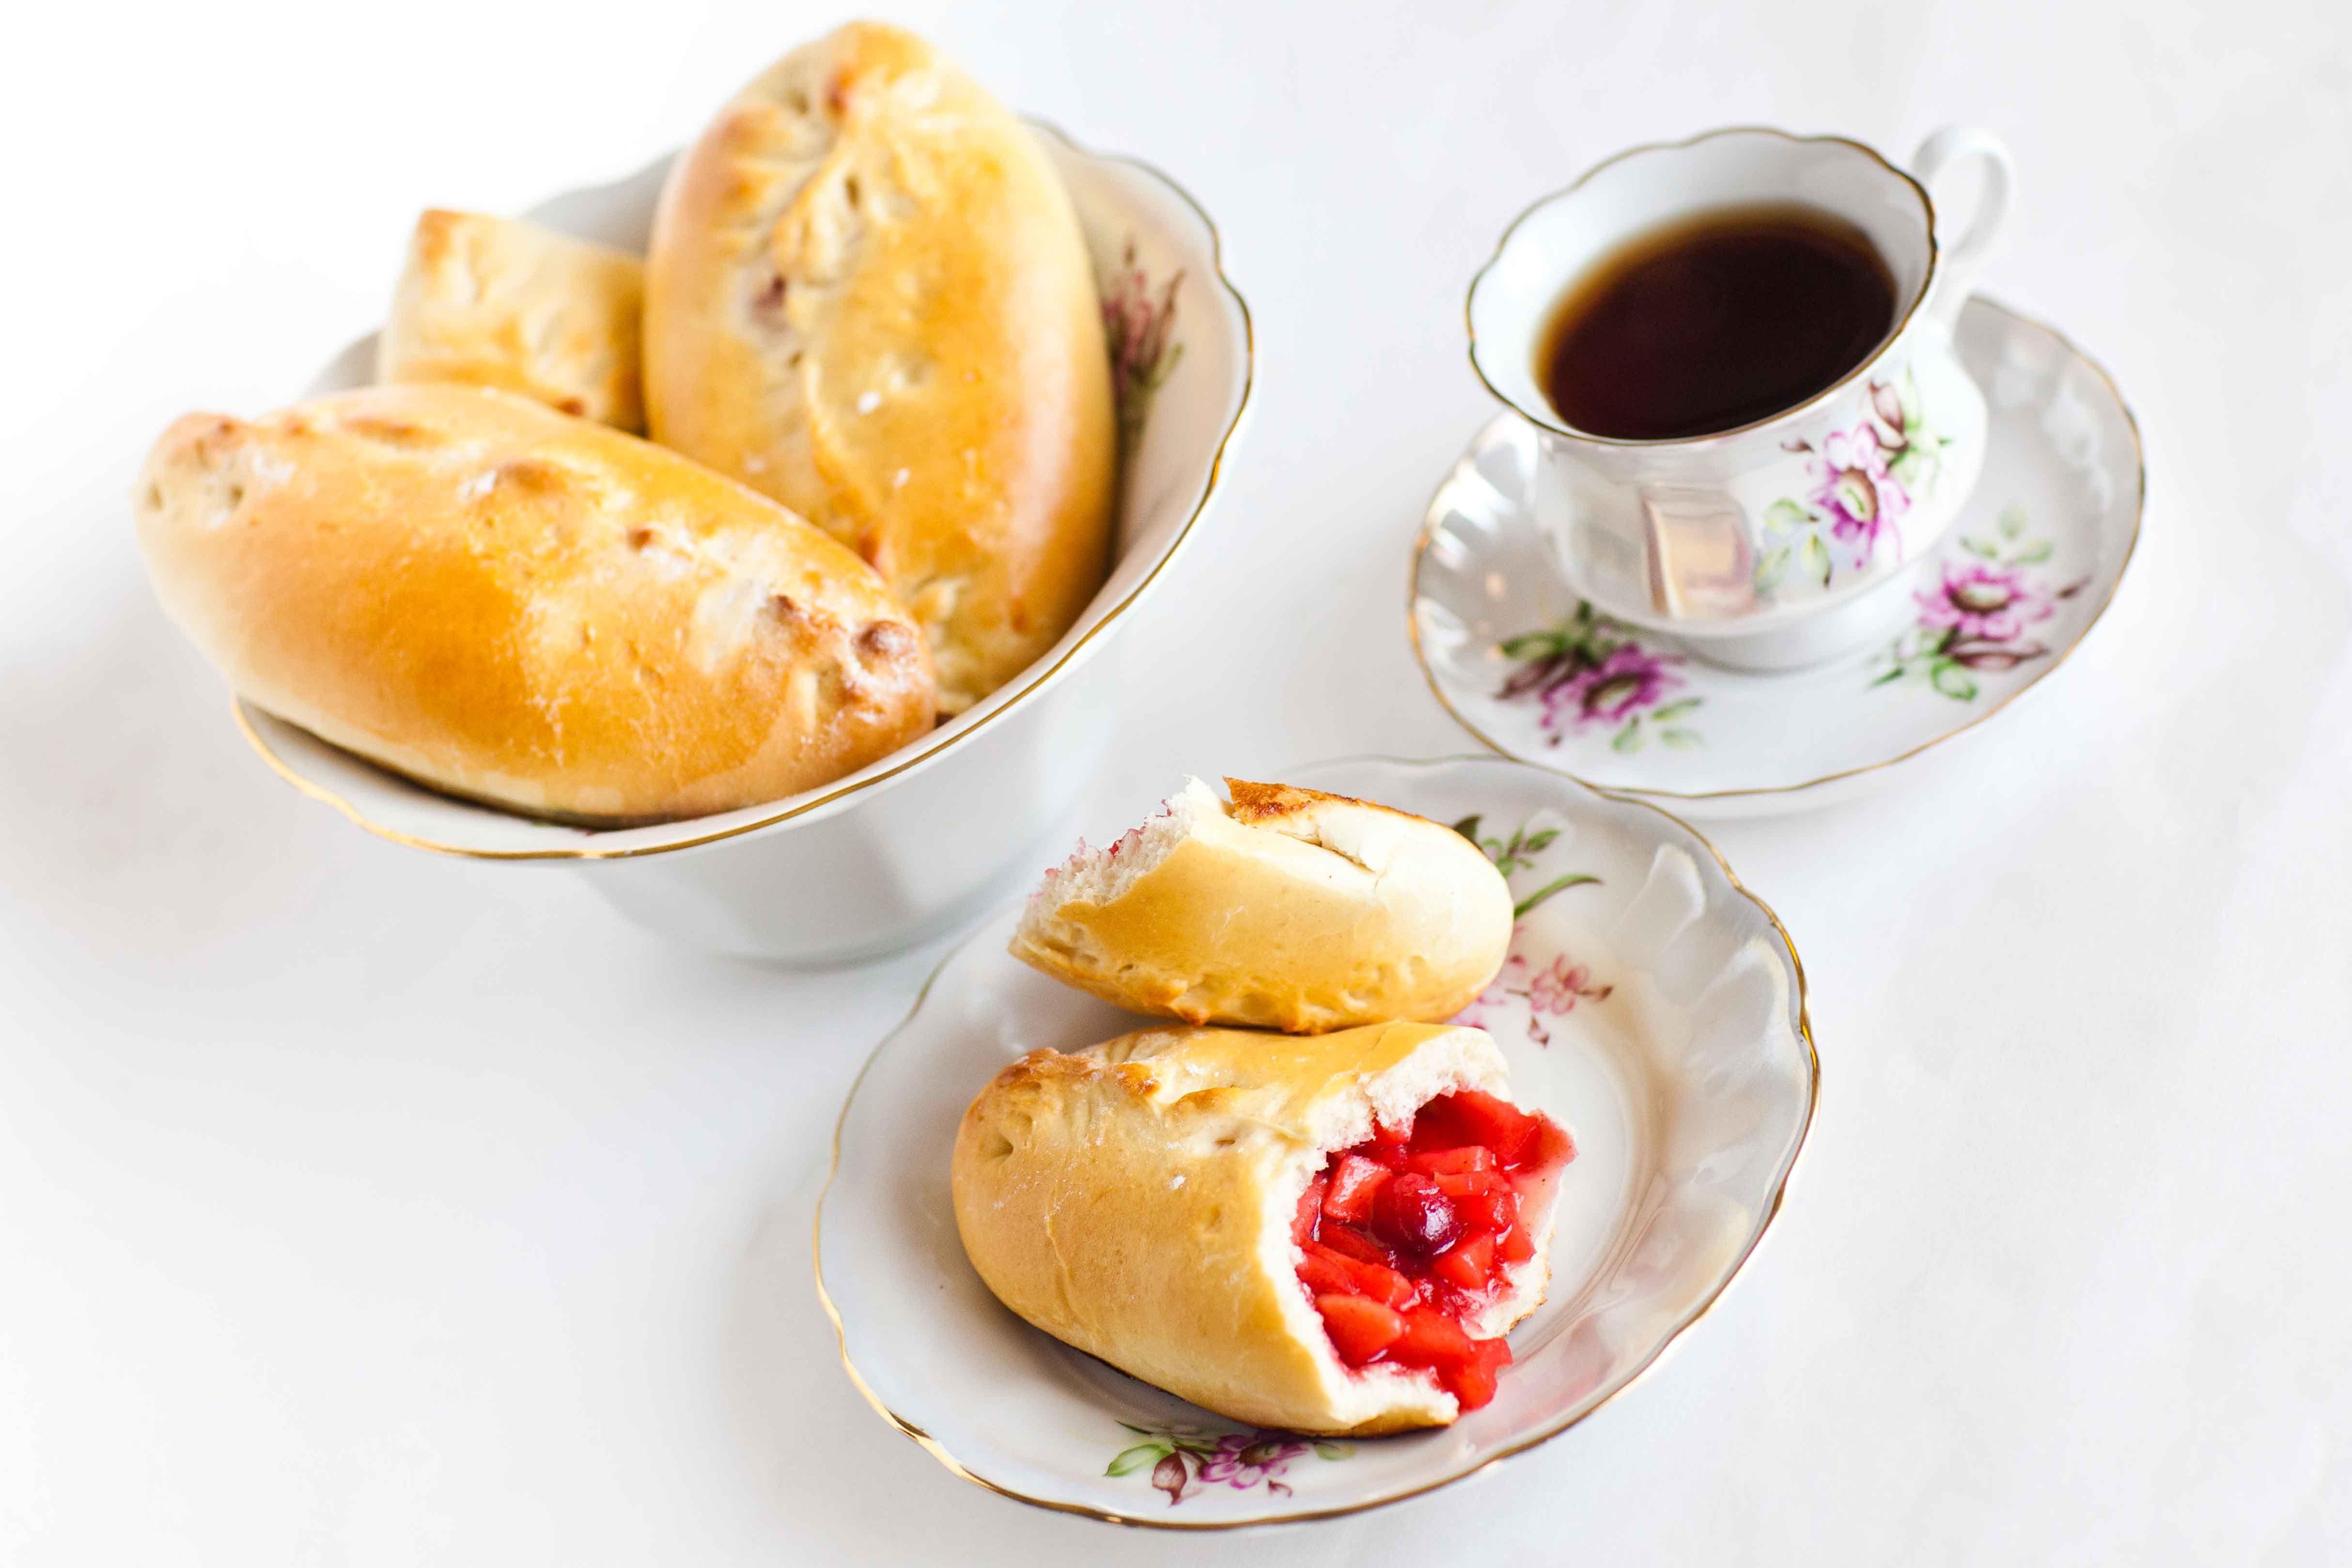 Tatyana S Everyday Food Piroshki